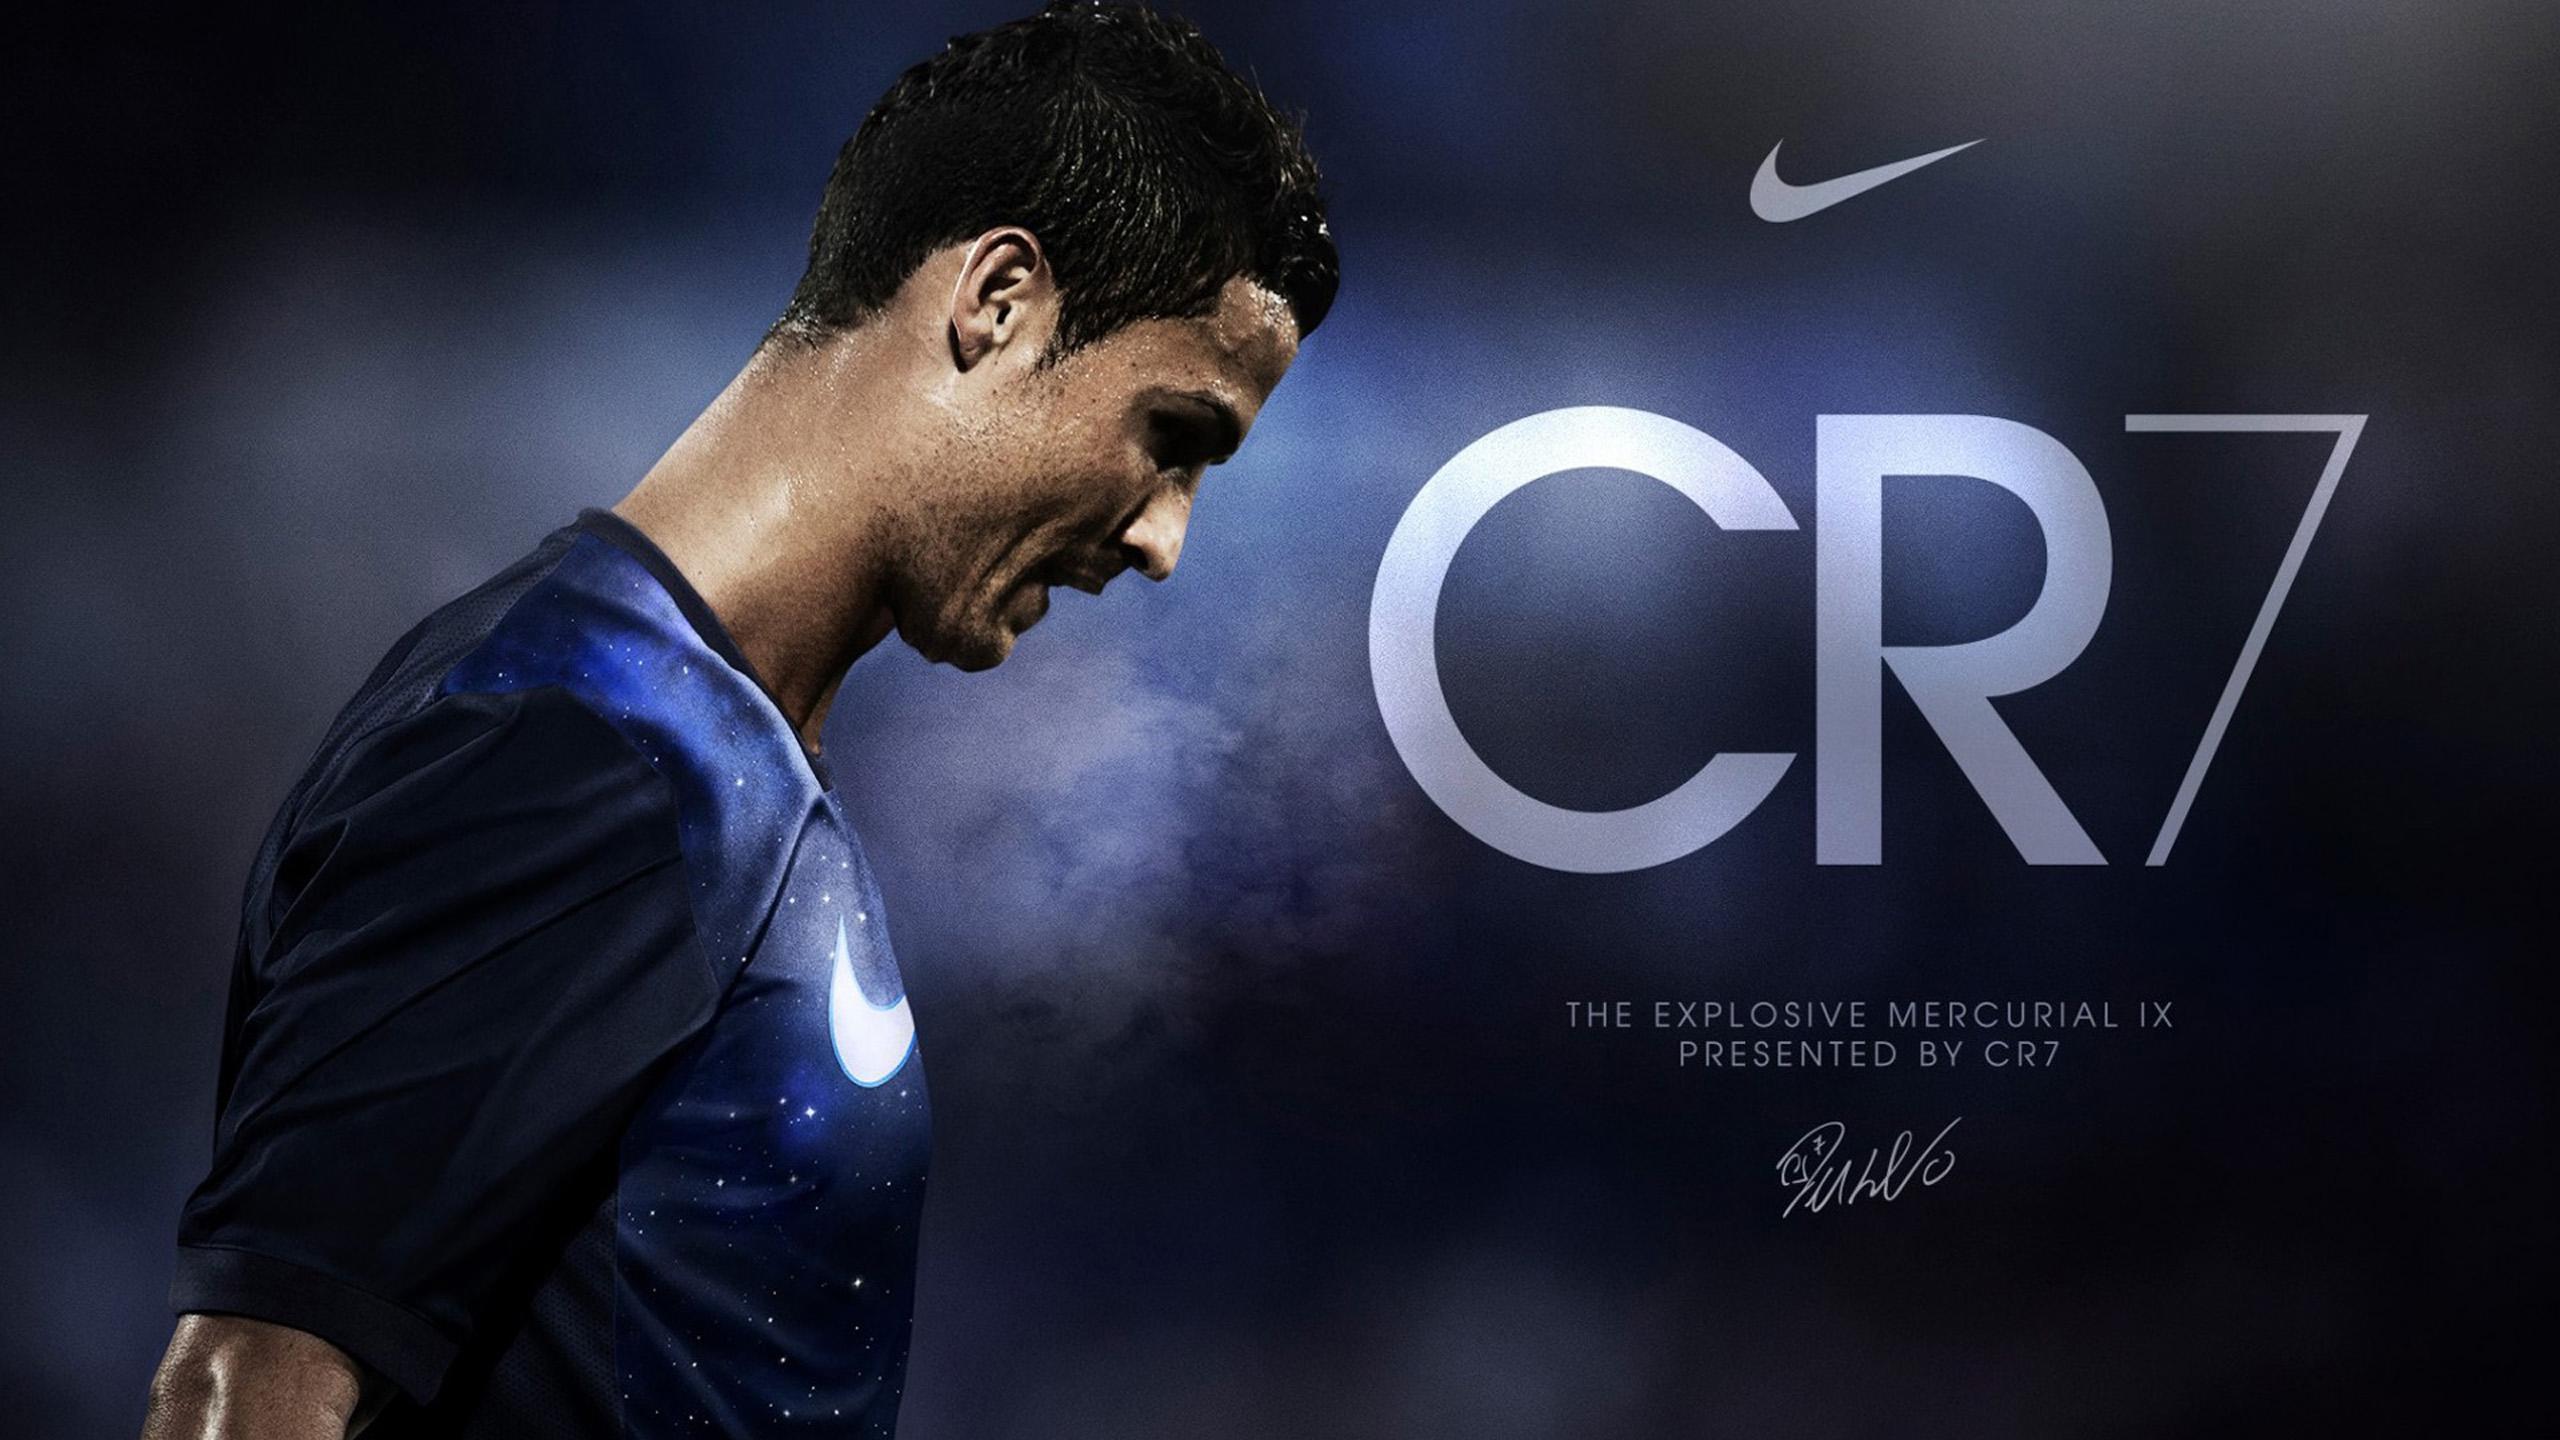 Cristiano Ronaldo Nike CR7 HD desktop wallpaper 2560x1440